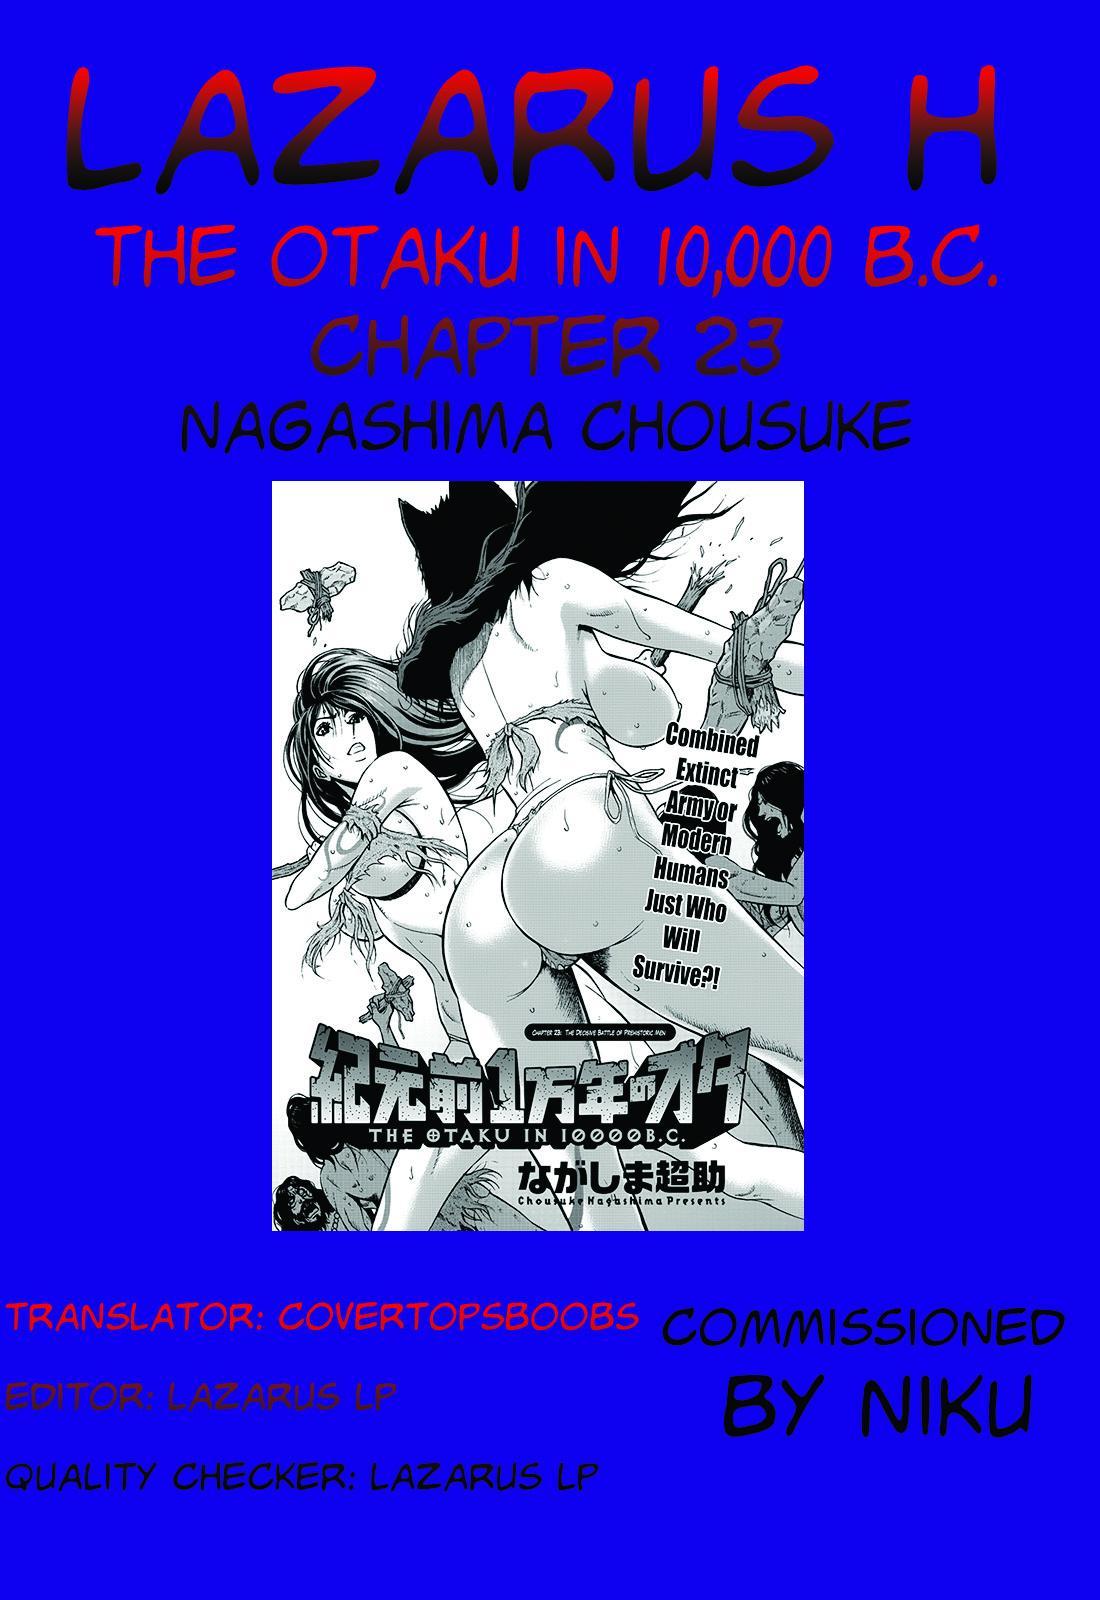 Kigenzen 10000 Nen no Ota | The Otaku in 10,000 B.C. 440